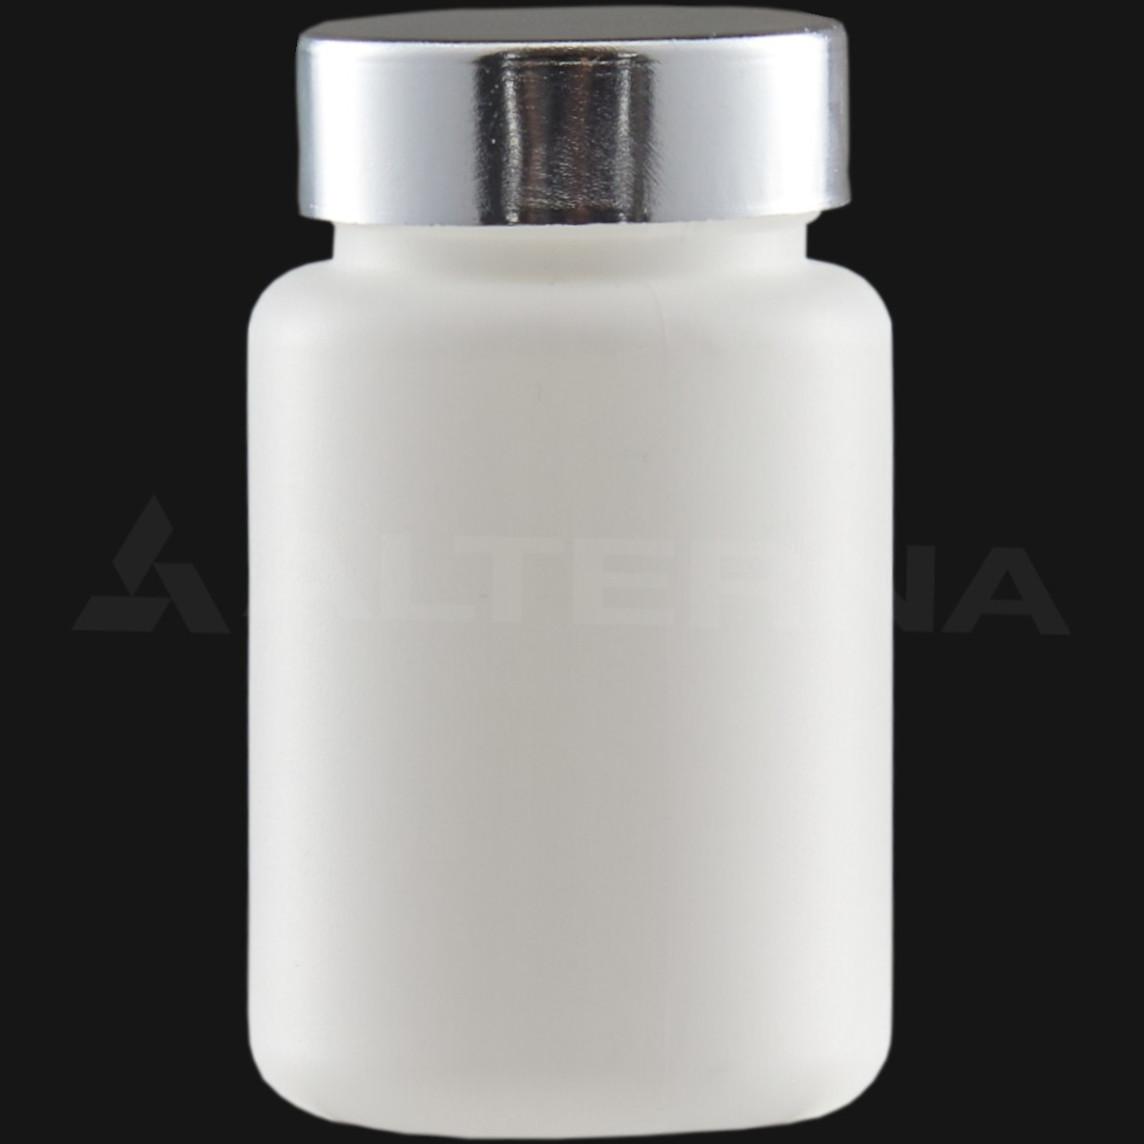 100 ml HDPE Pill Bottle with 38 mm Metal Cap